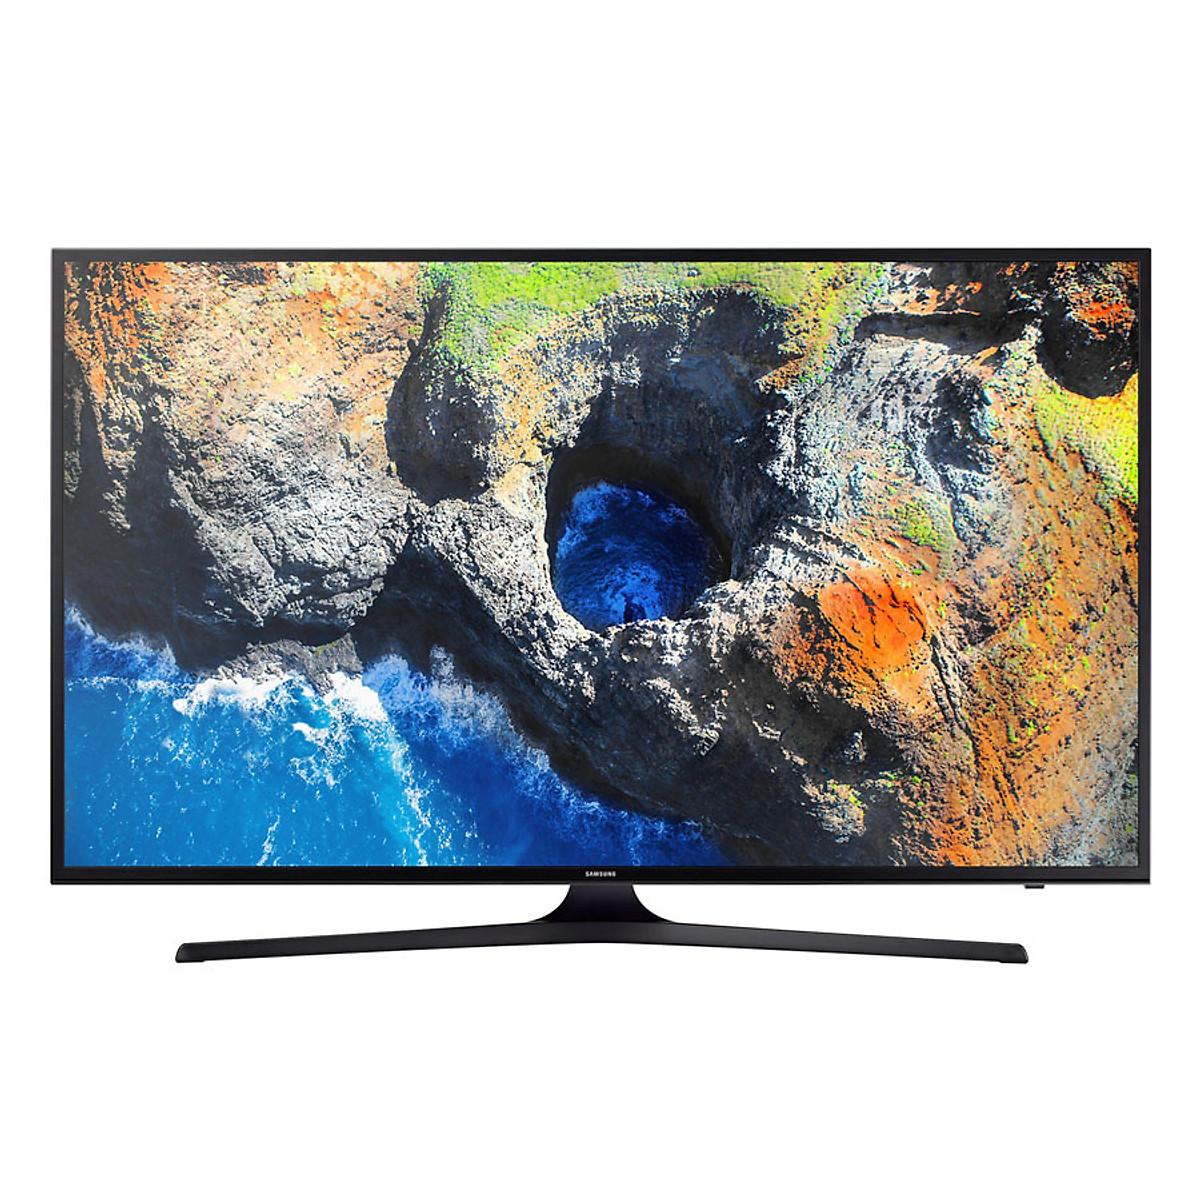 Smart Tivi Samsung 50 inch 4K UHD UA50MU6153 - nên mua tivi màn hình 55inch nào